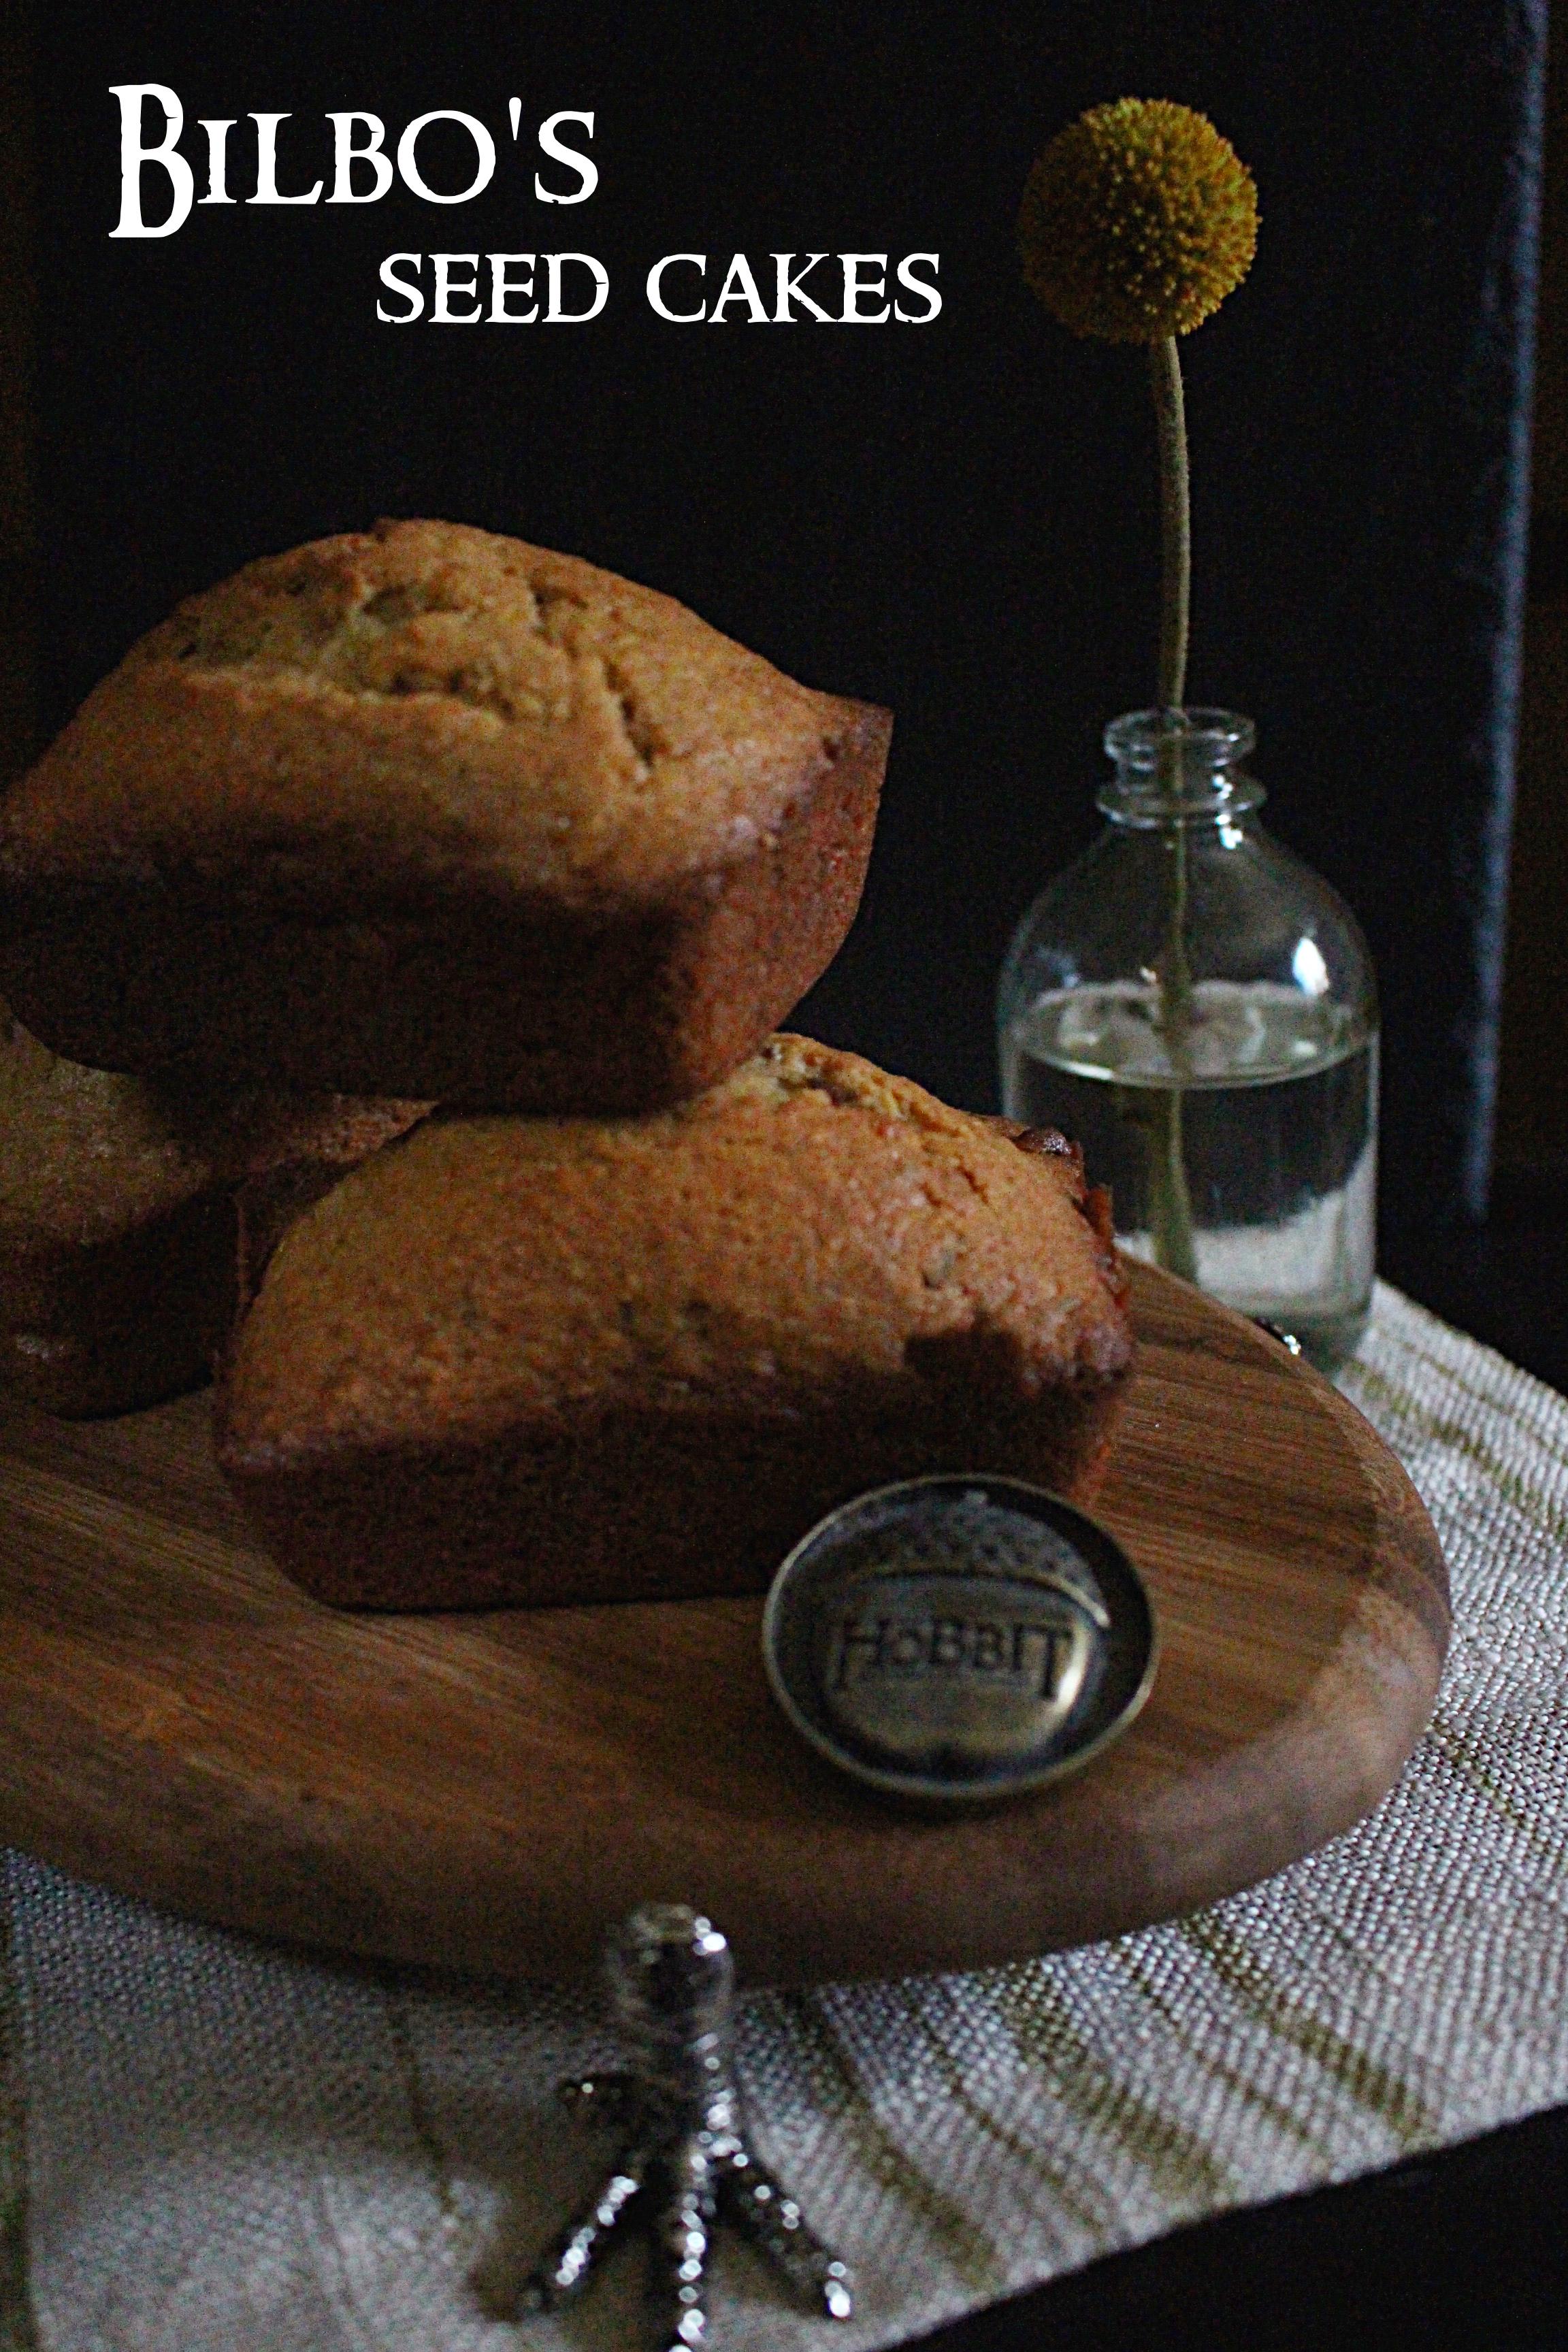 Hobbit gmail theme - The Hobbit Bilbo S Seed Cakes Recipe